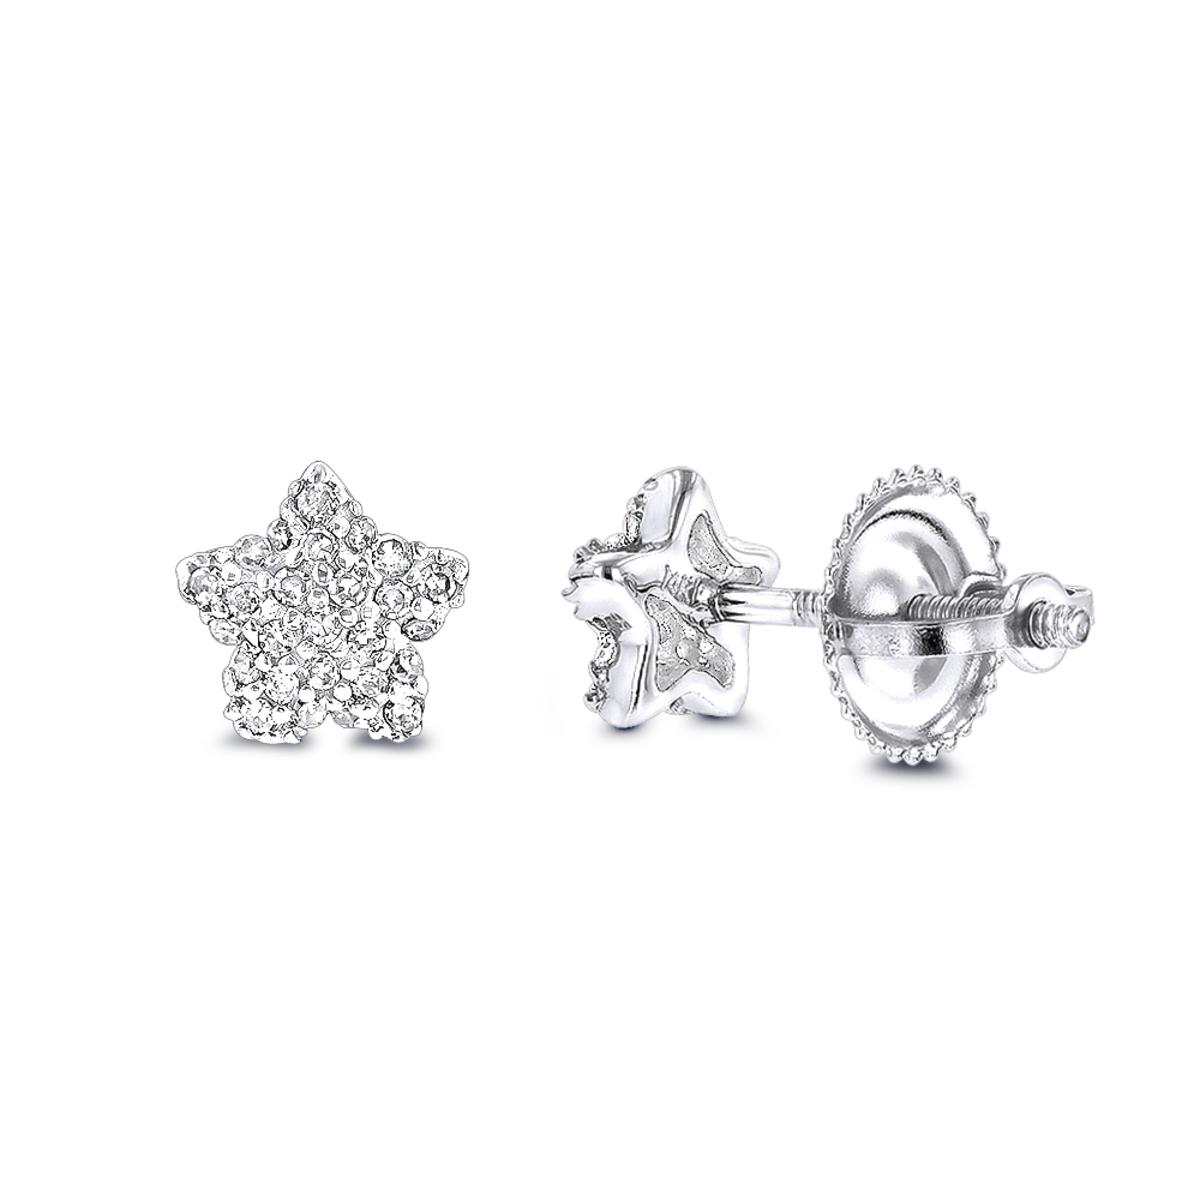 Small Diamond Star Earrings Studs 0.11ct 14K Gold